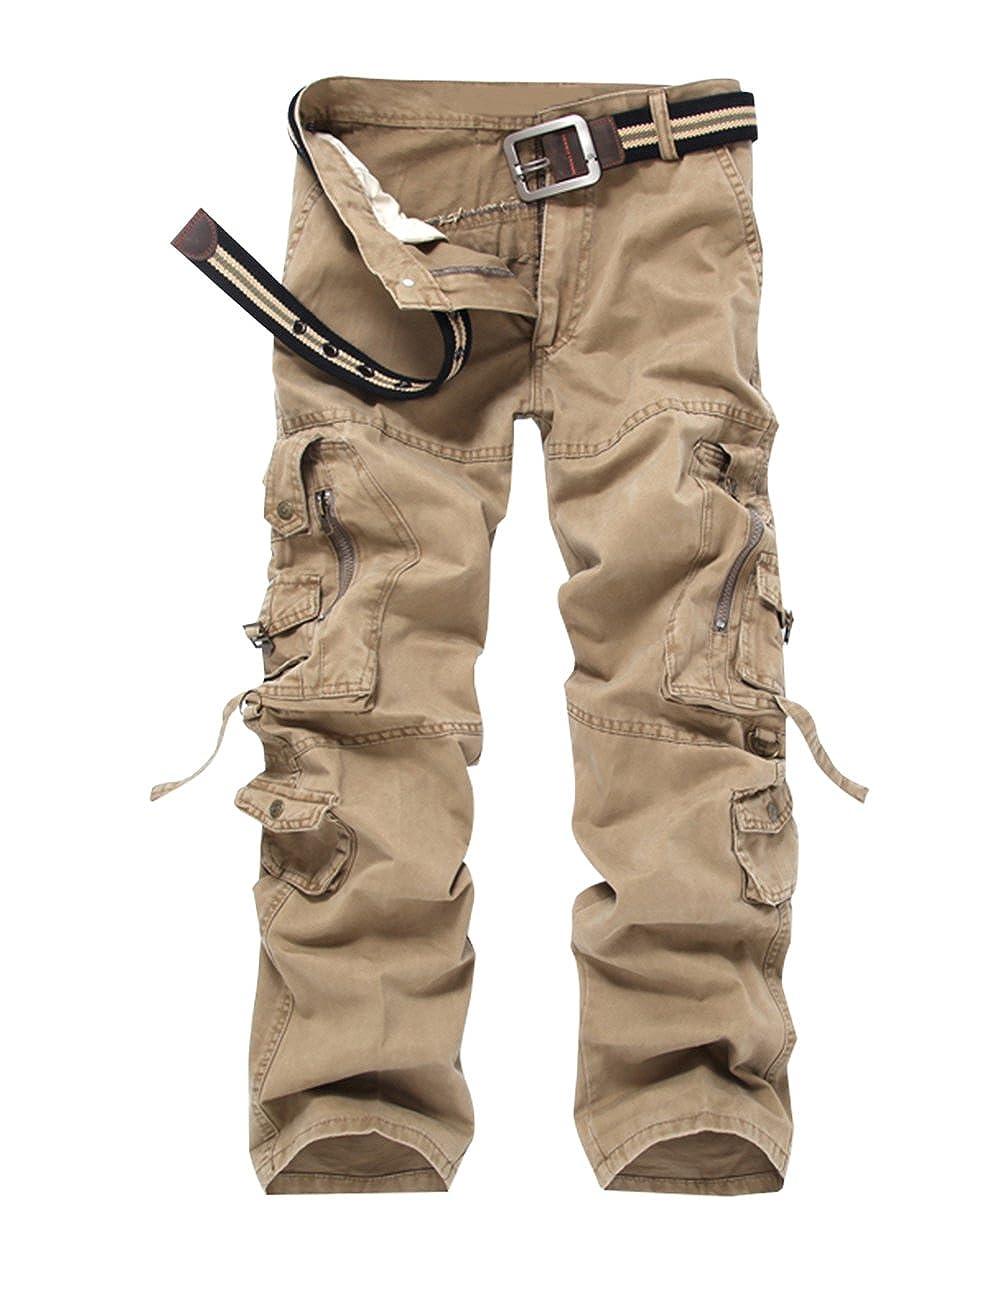 Cukke Men's Cargo Pants Multi-Pockets Cotton Washed Outwear WUXI SHUAILANDE USA-CUAY-K03